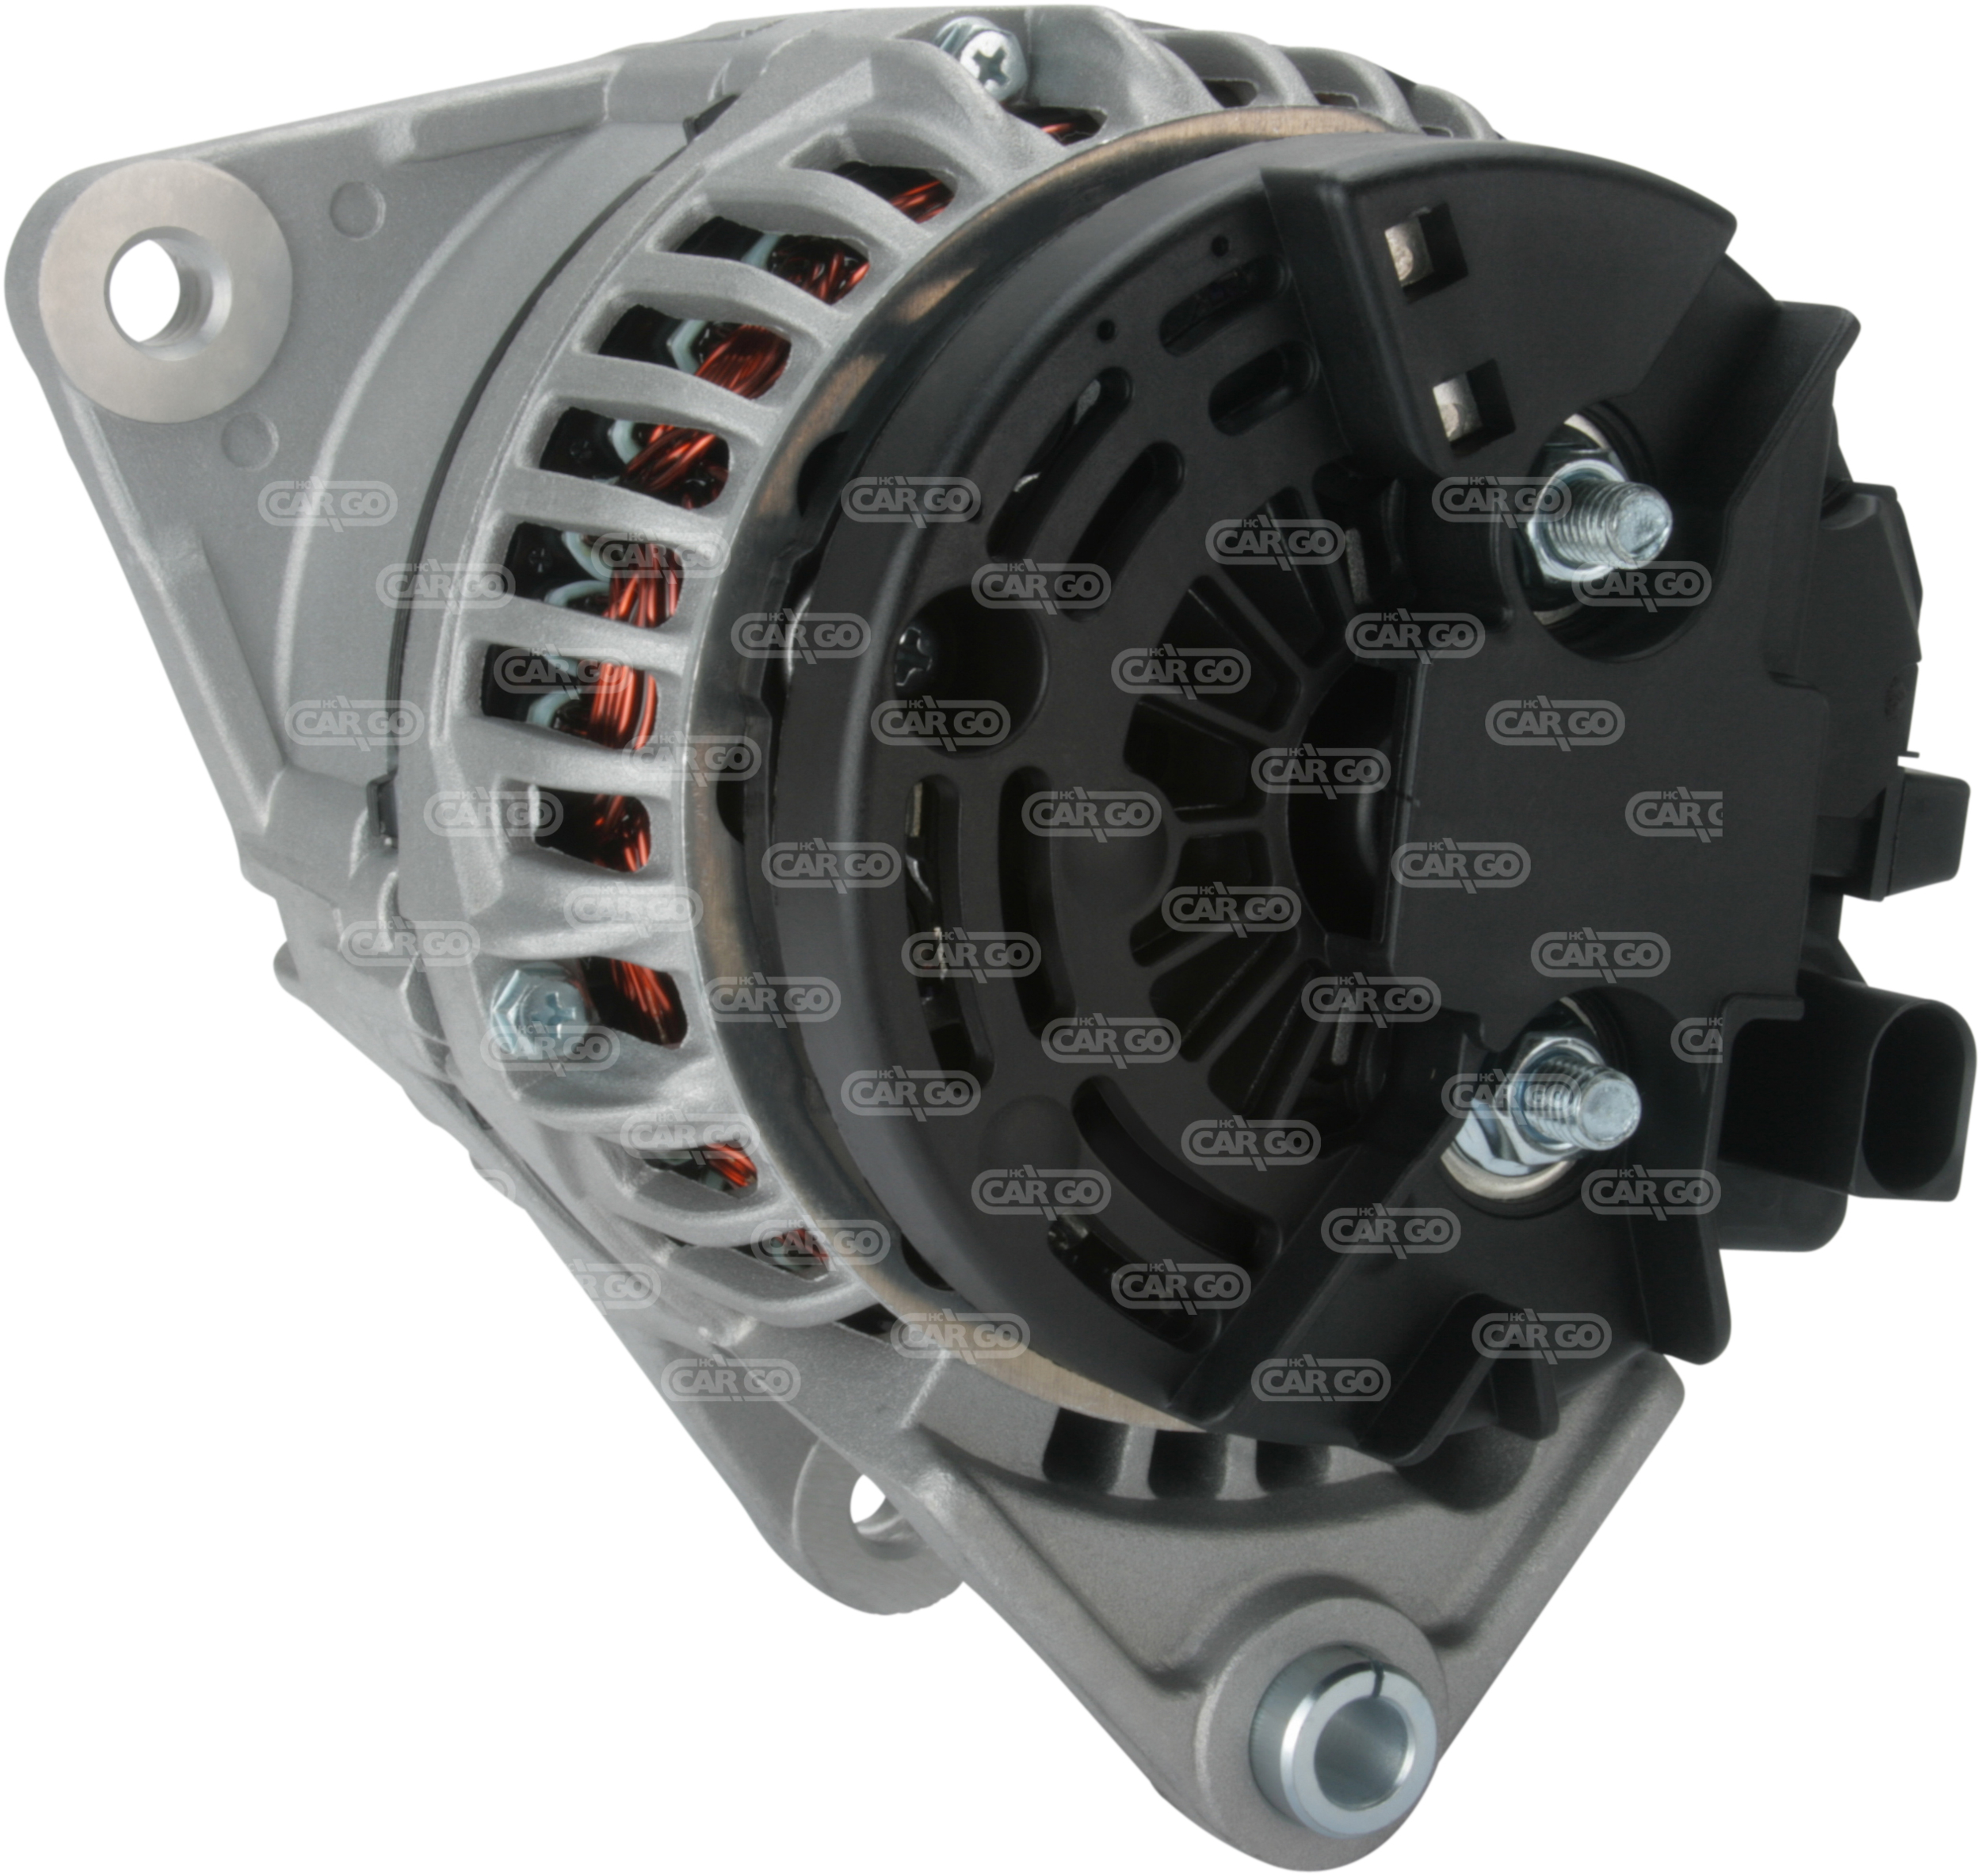 Alternateur 718 Voltage14 Amp140